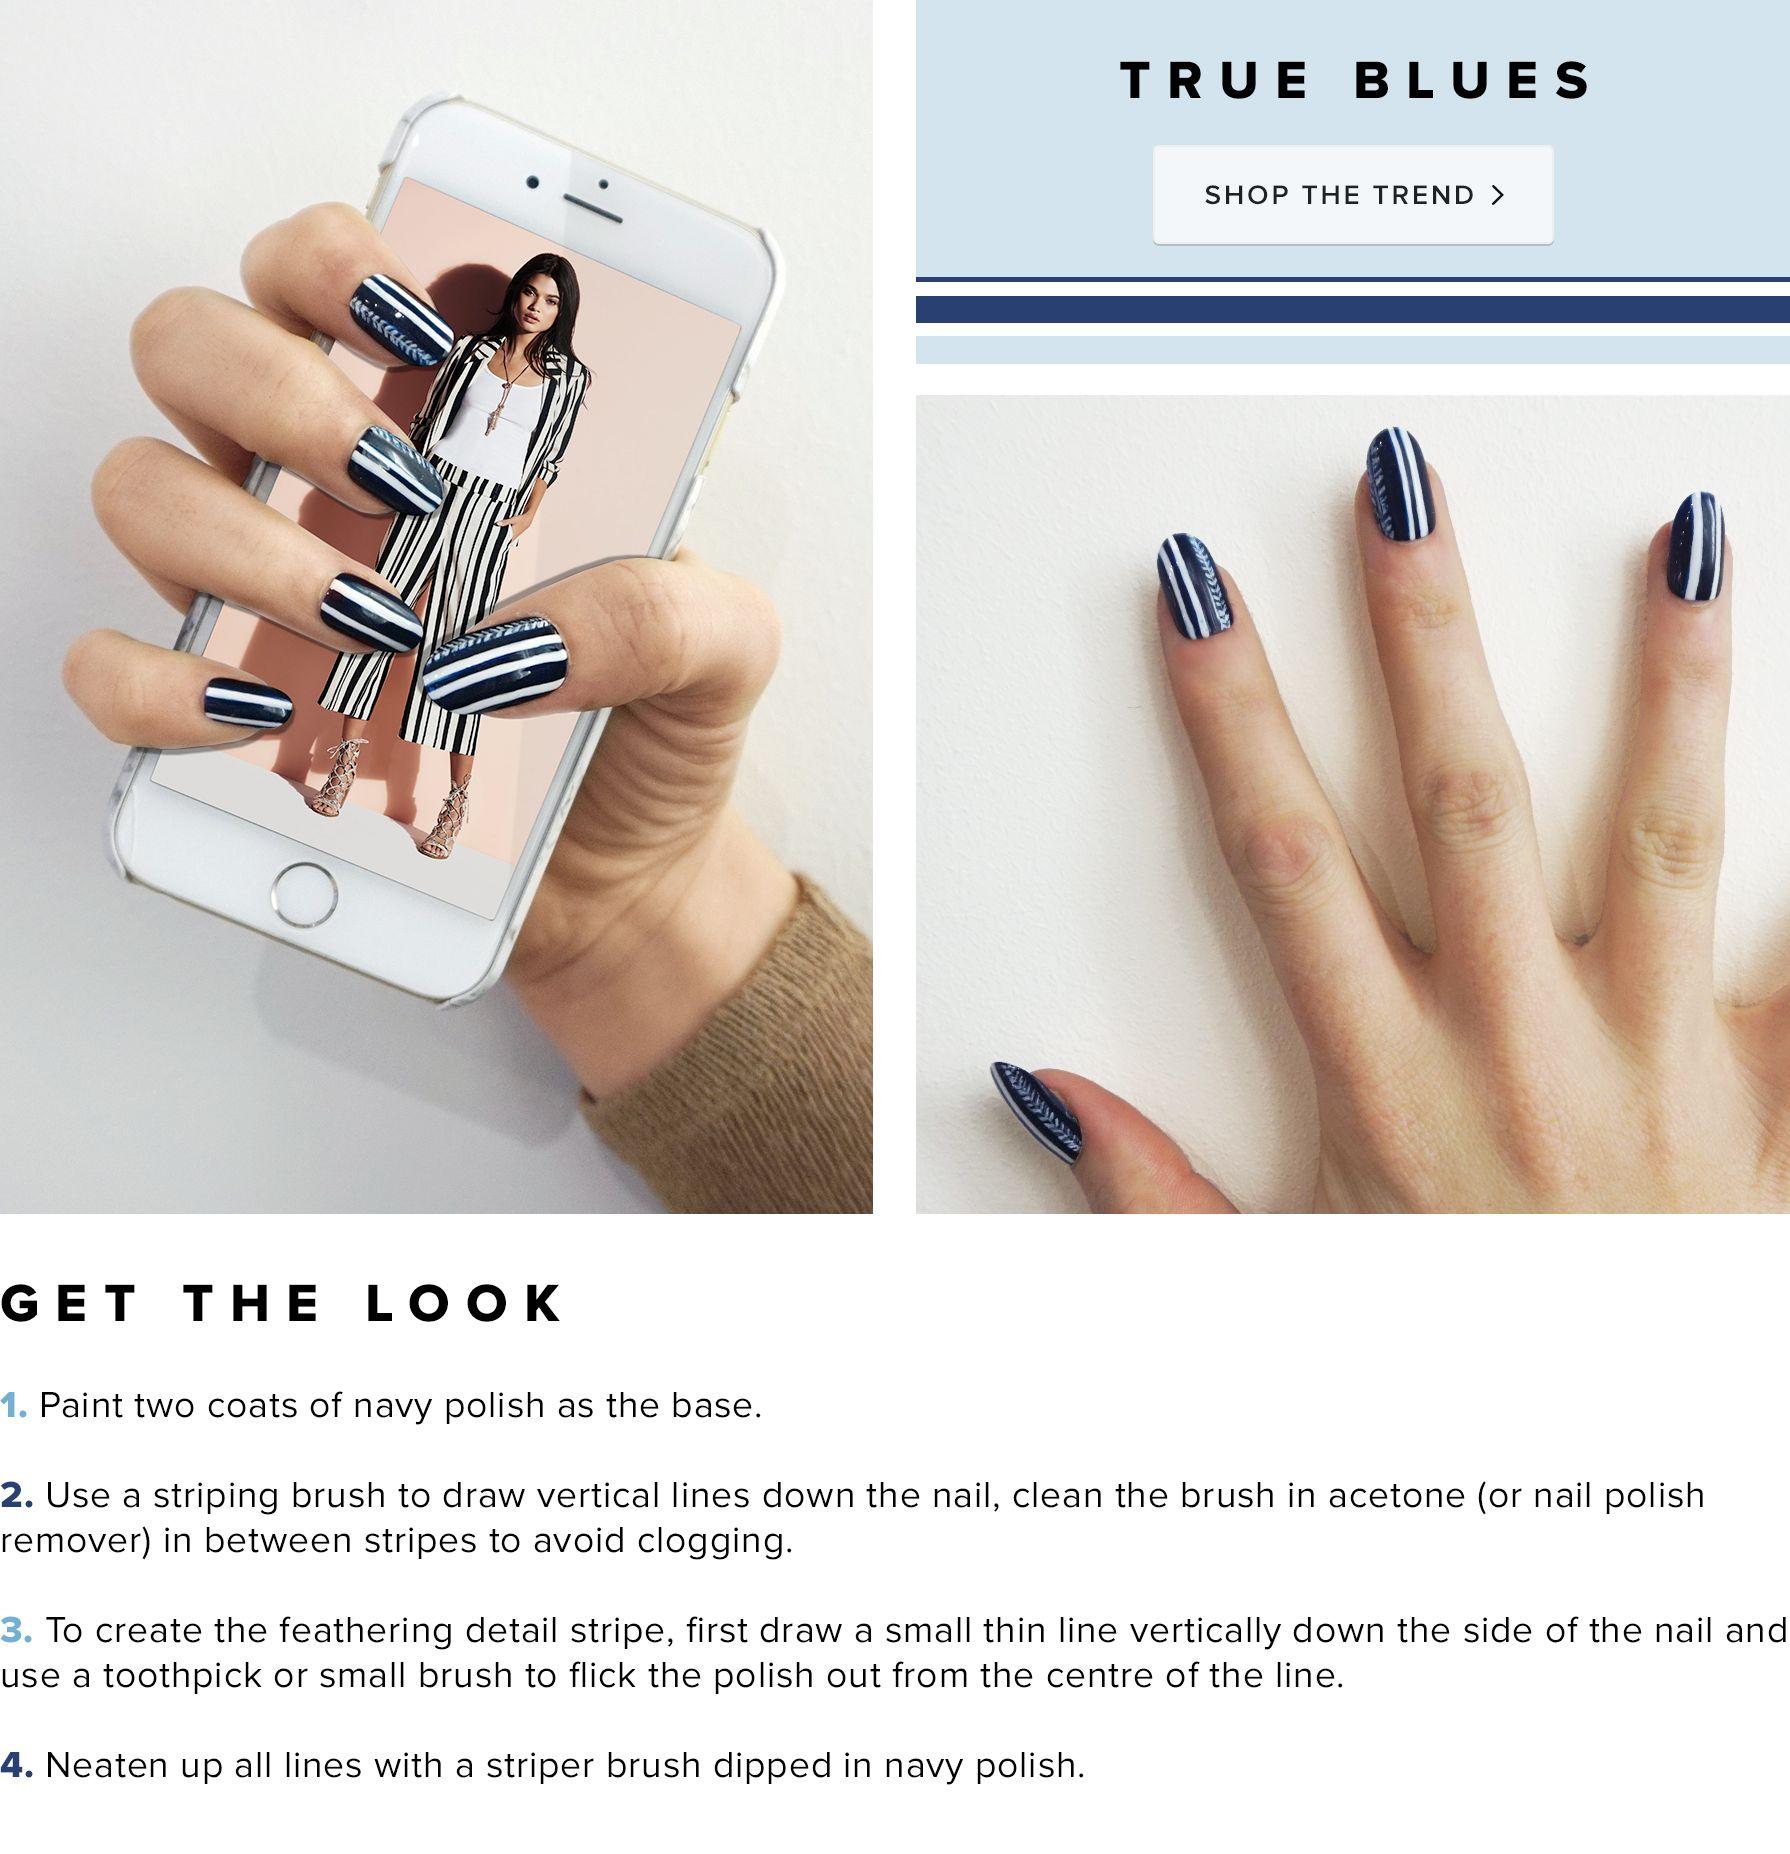 Voorjaarstrends: tutorial over nagelkunst - Blog - Style Insider ...